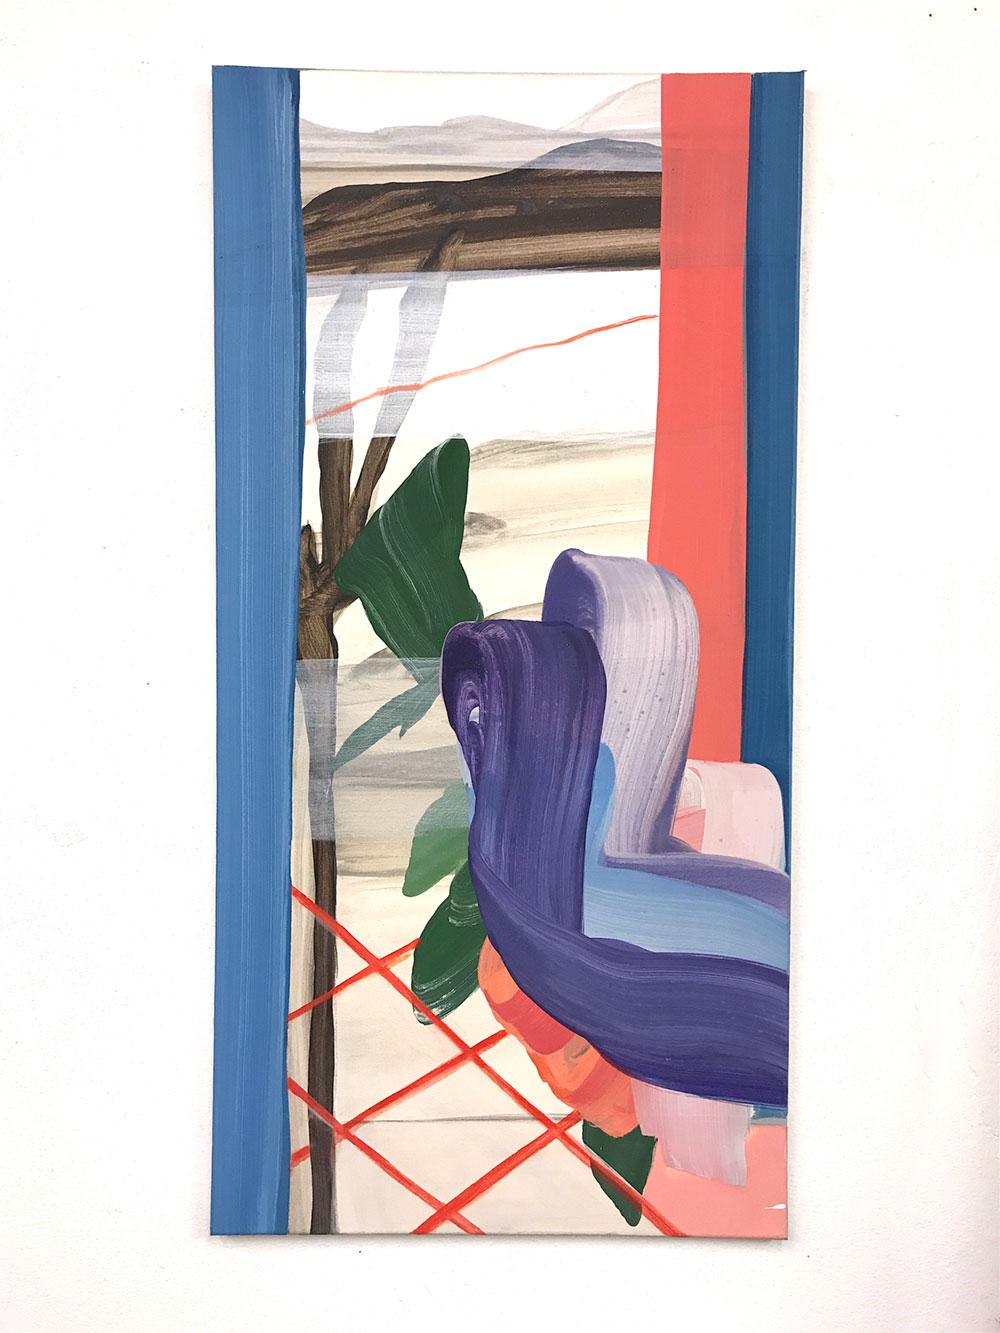 moje assefjah Branch 2017 eggtempera on canvas 100x-50 cm sholeh abghari art gallery marbella